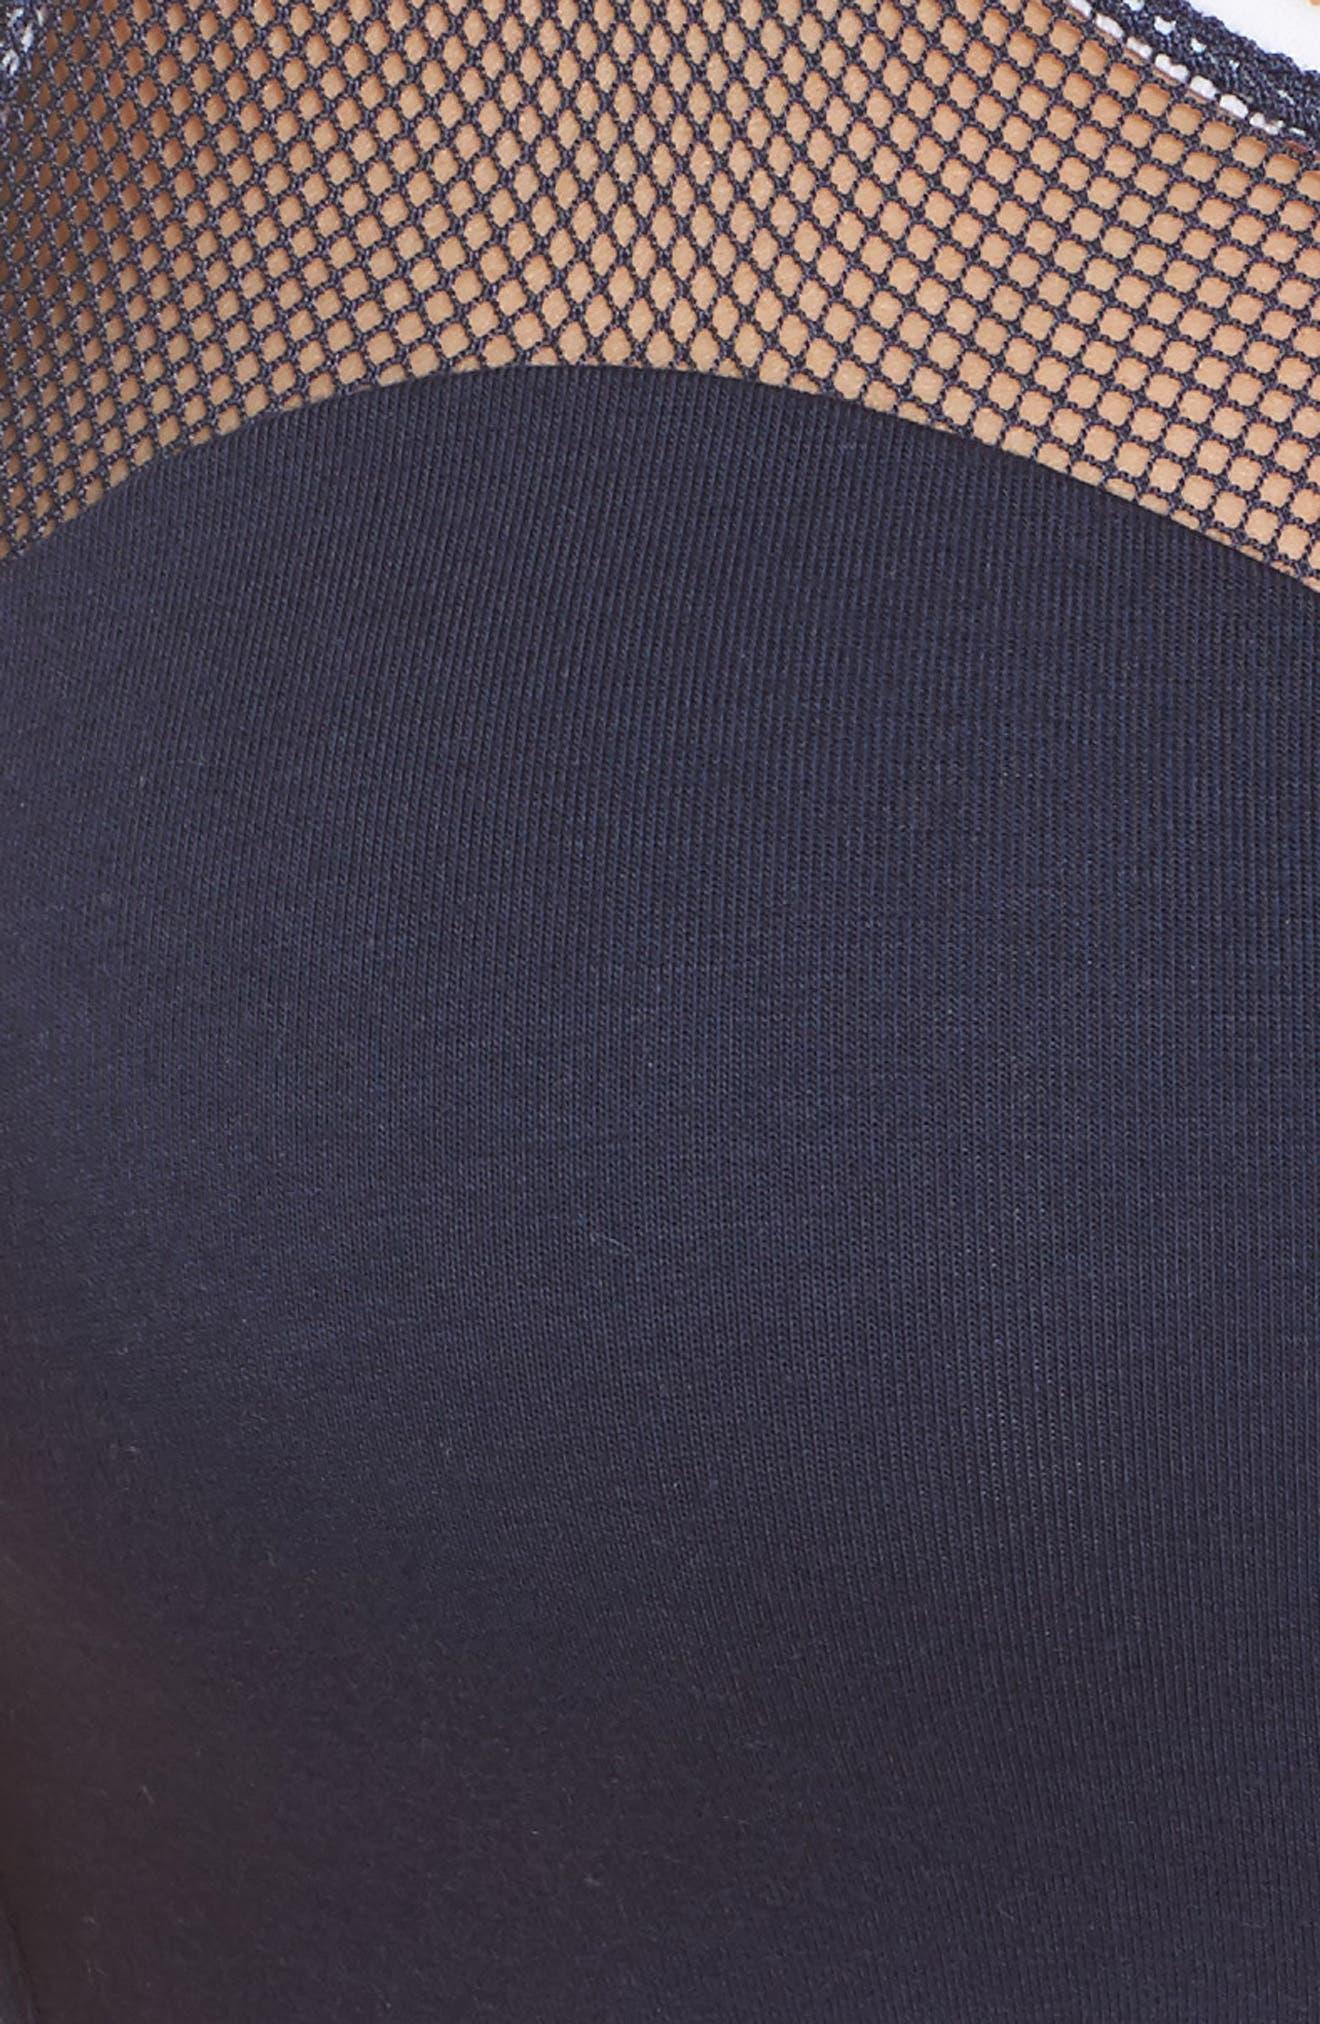 Push-Up Bralette,                             Alternate thumbnail 12, color,